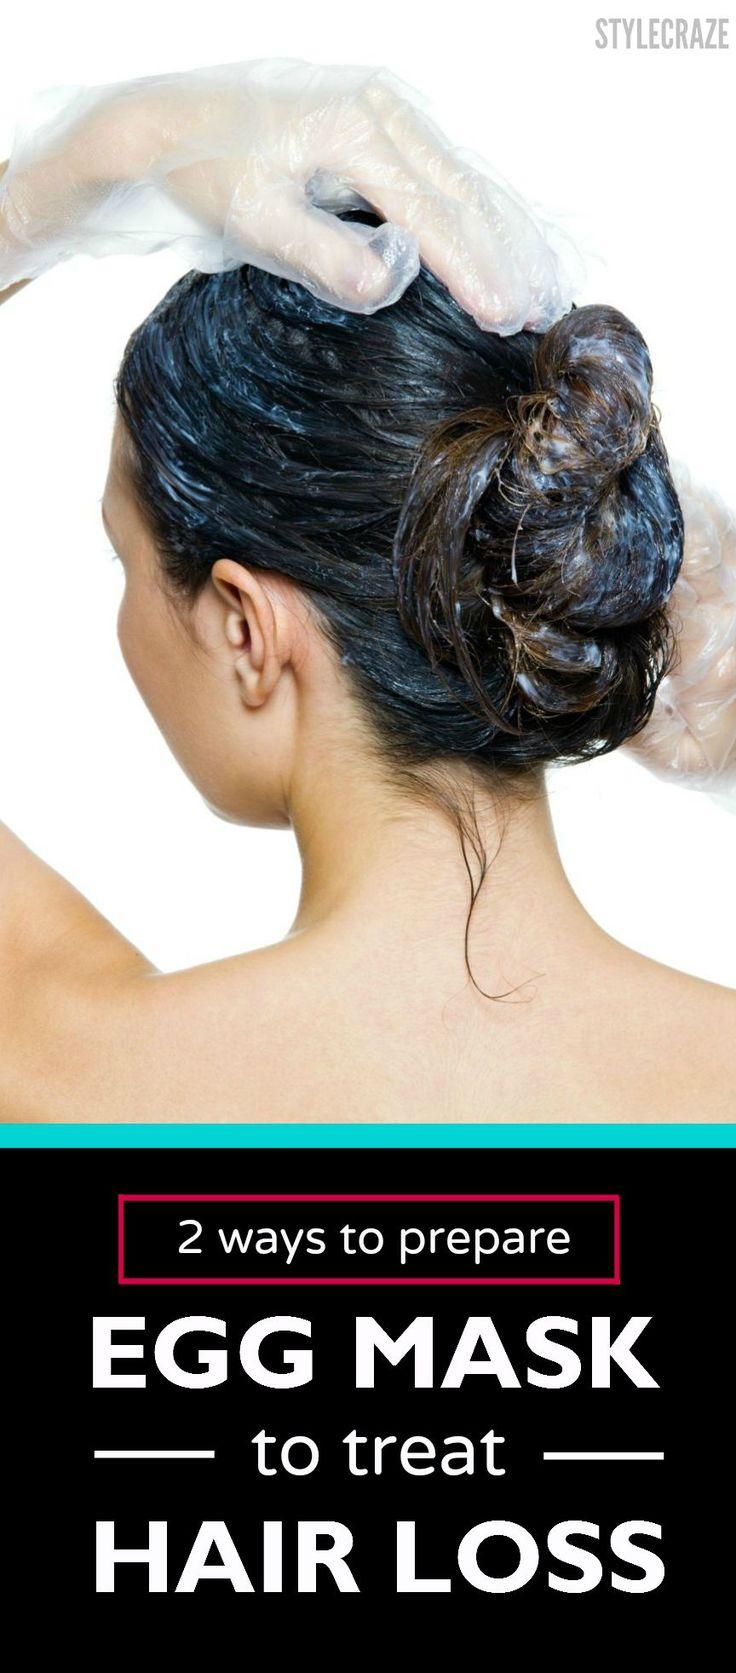 How Eggs Prevent Hair Loss And Aid Hair Growth